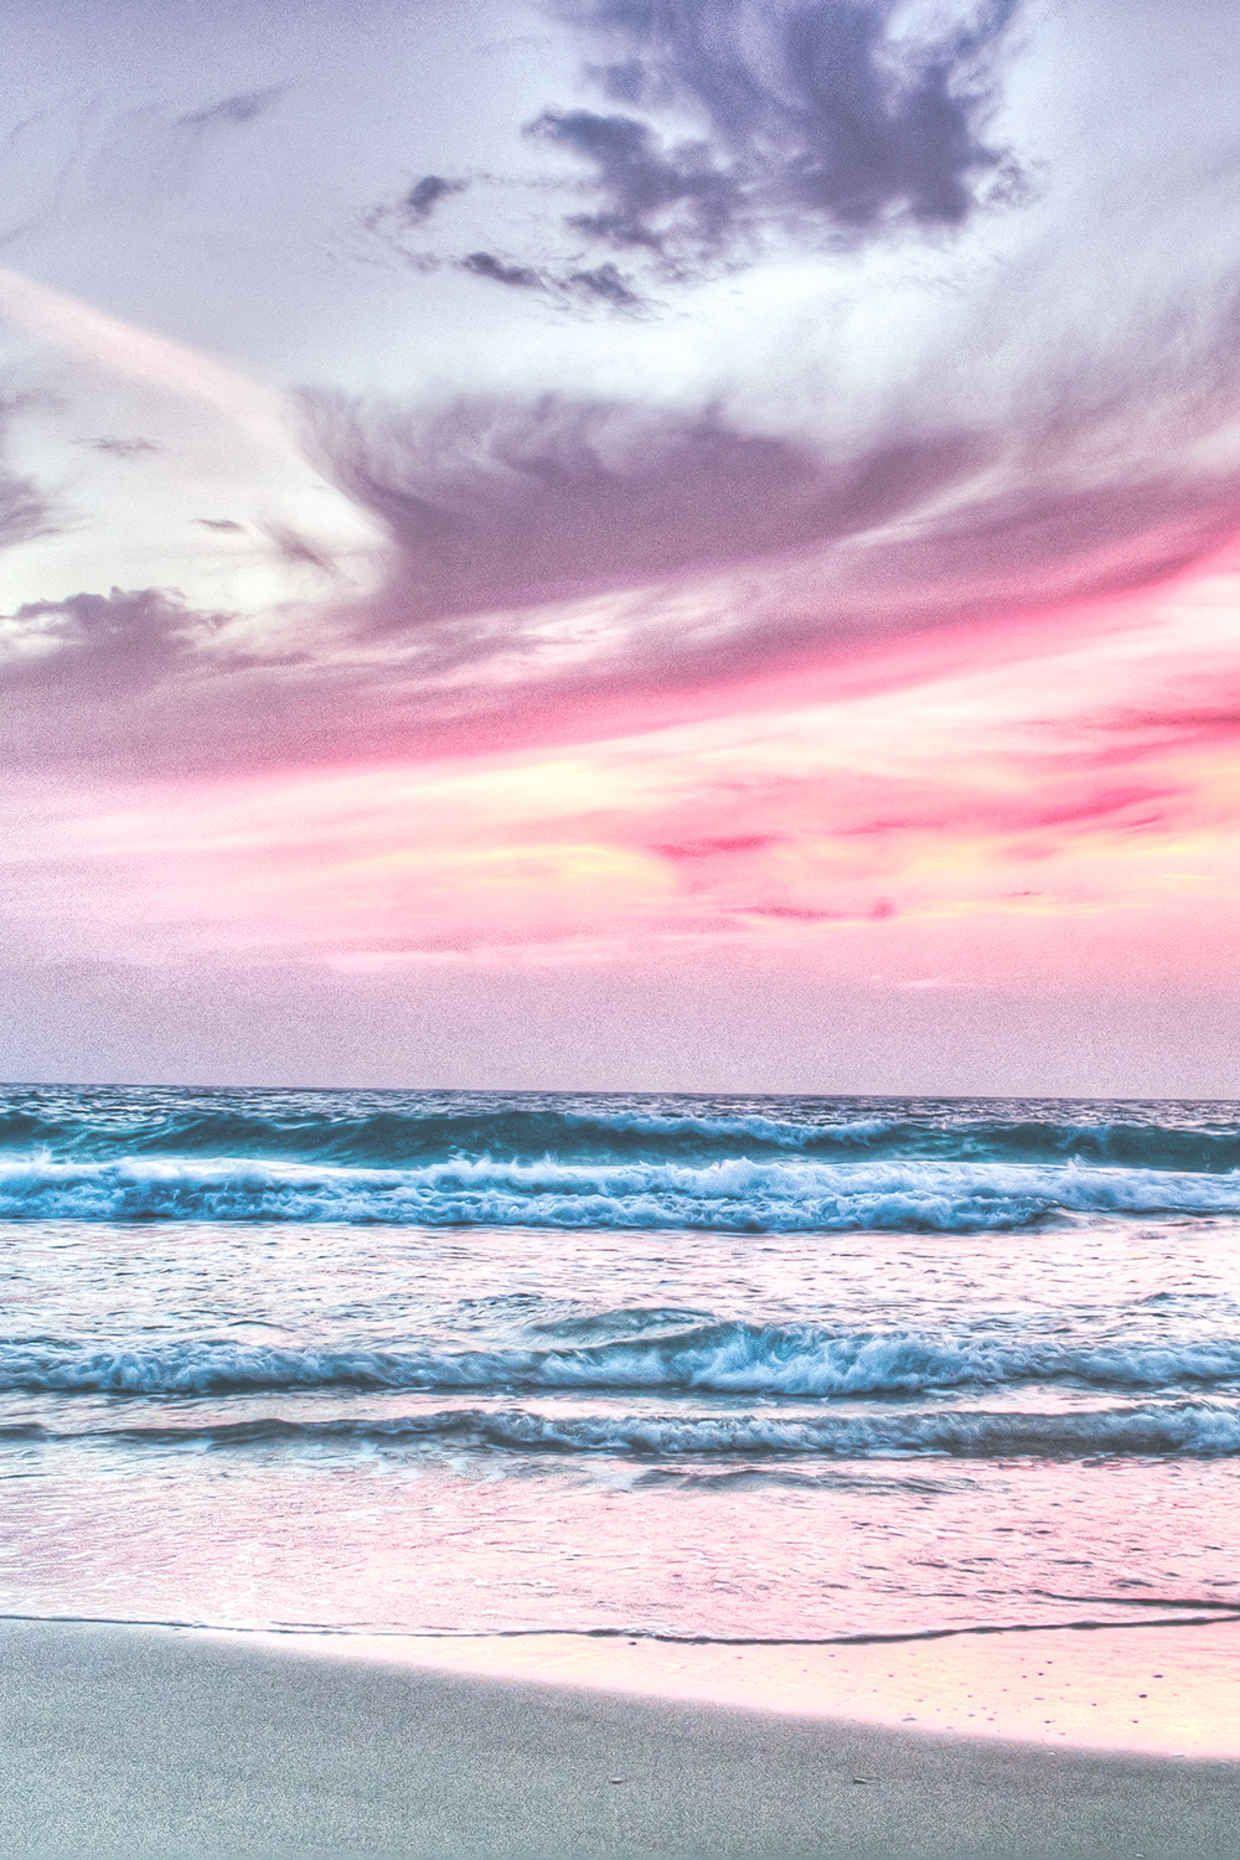 Iphone wallpaper tumblr ocean - Weekly Inspiration 47 Iphone Backgroundsiphone